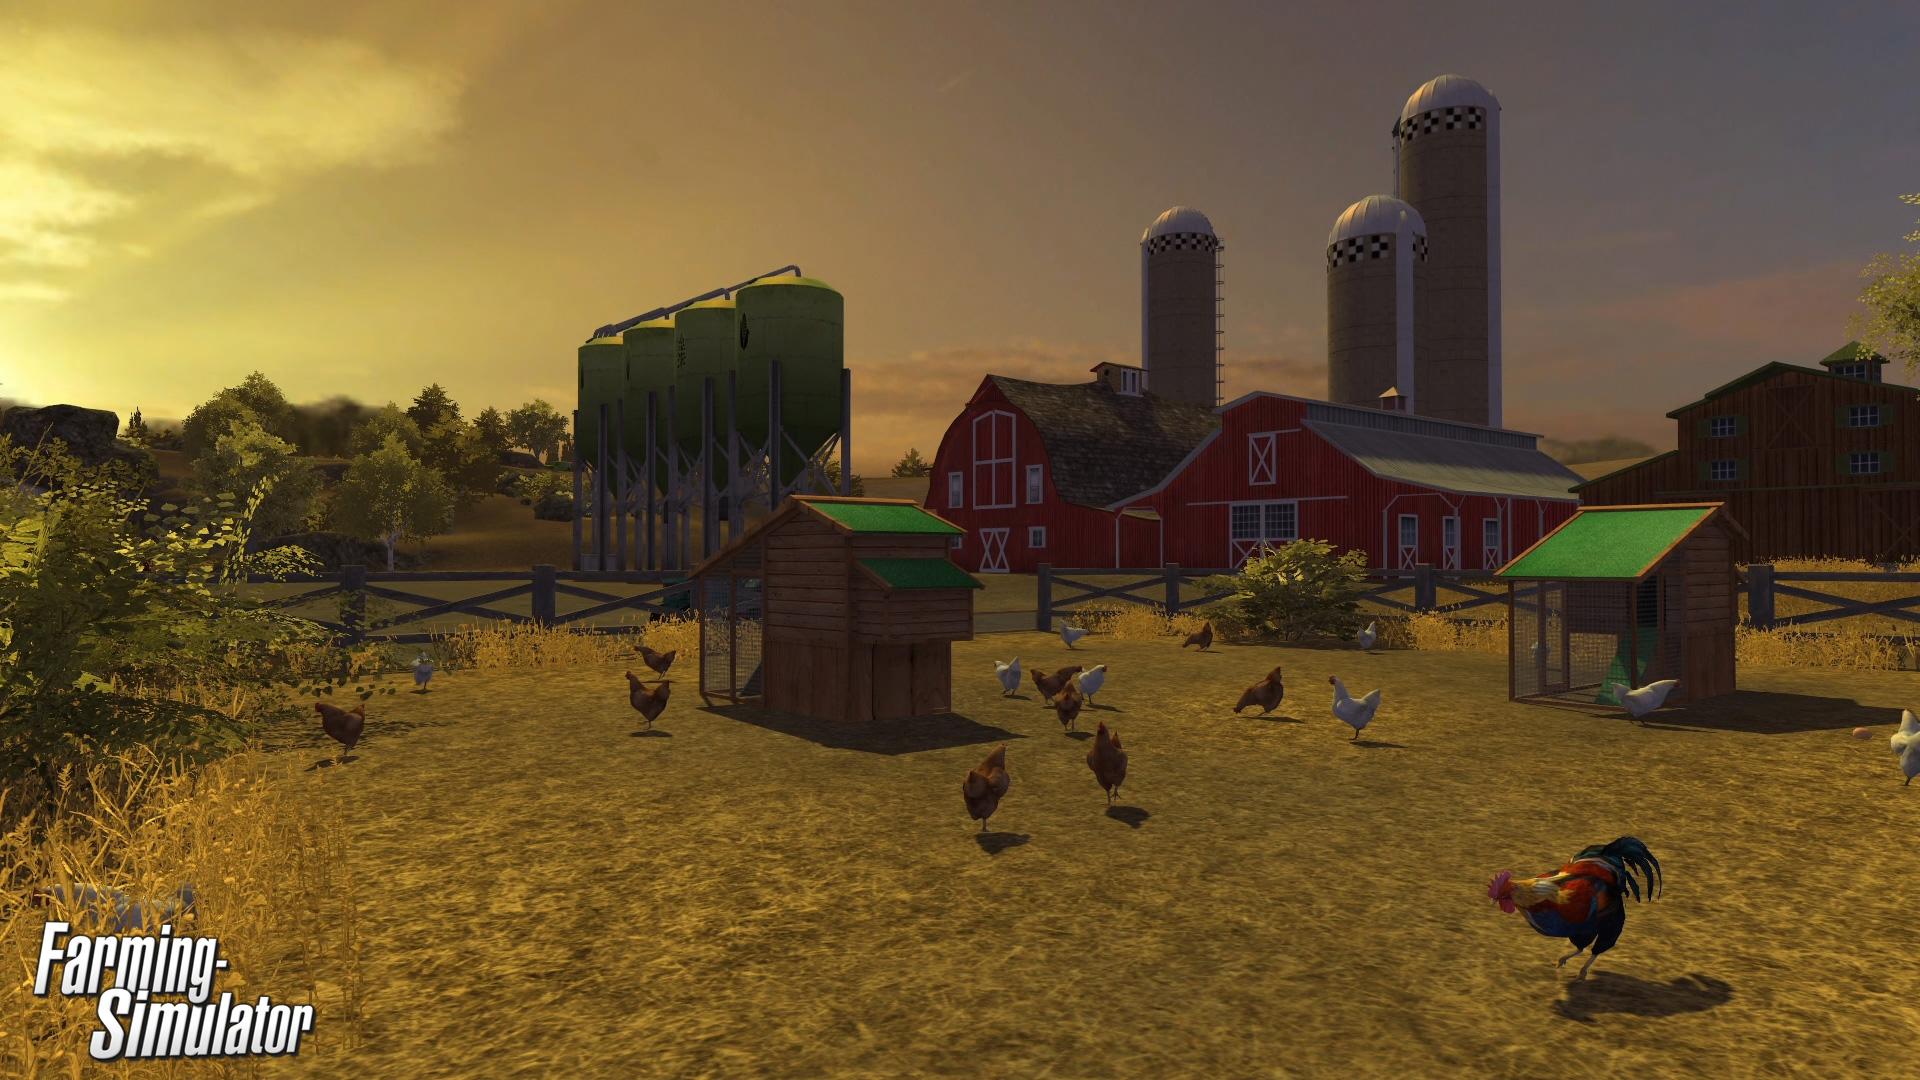 Nové obrázky z konzolové verze Farming Simulatoru 85777